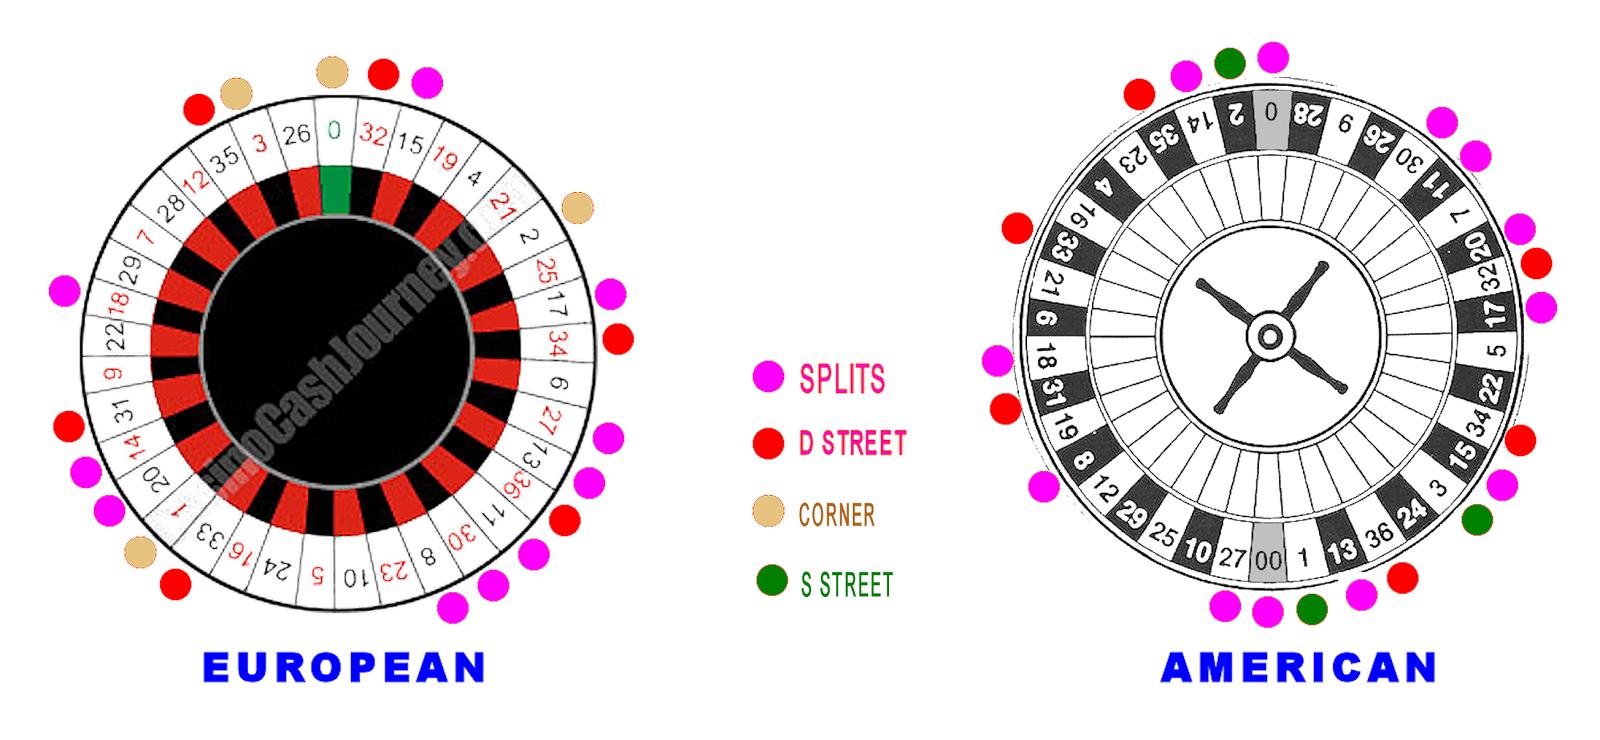 Best cash poker sites